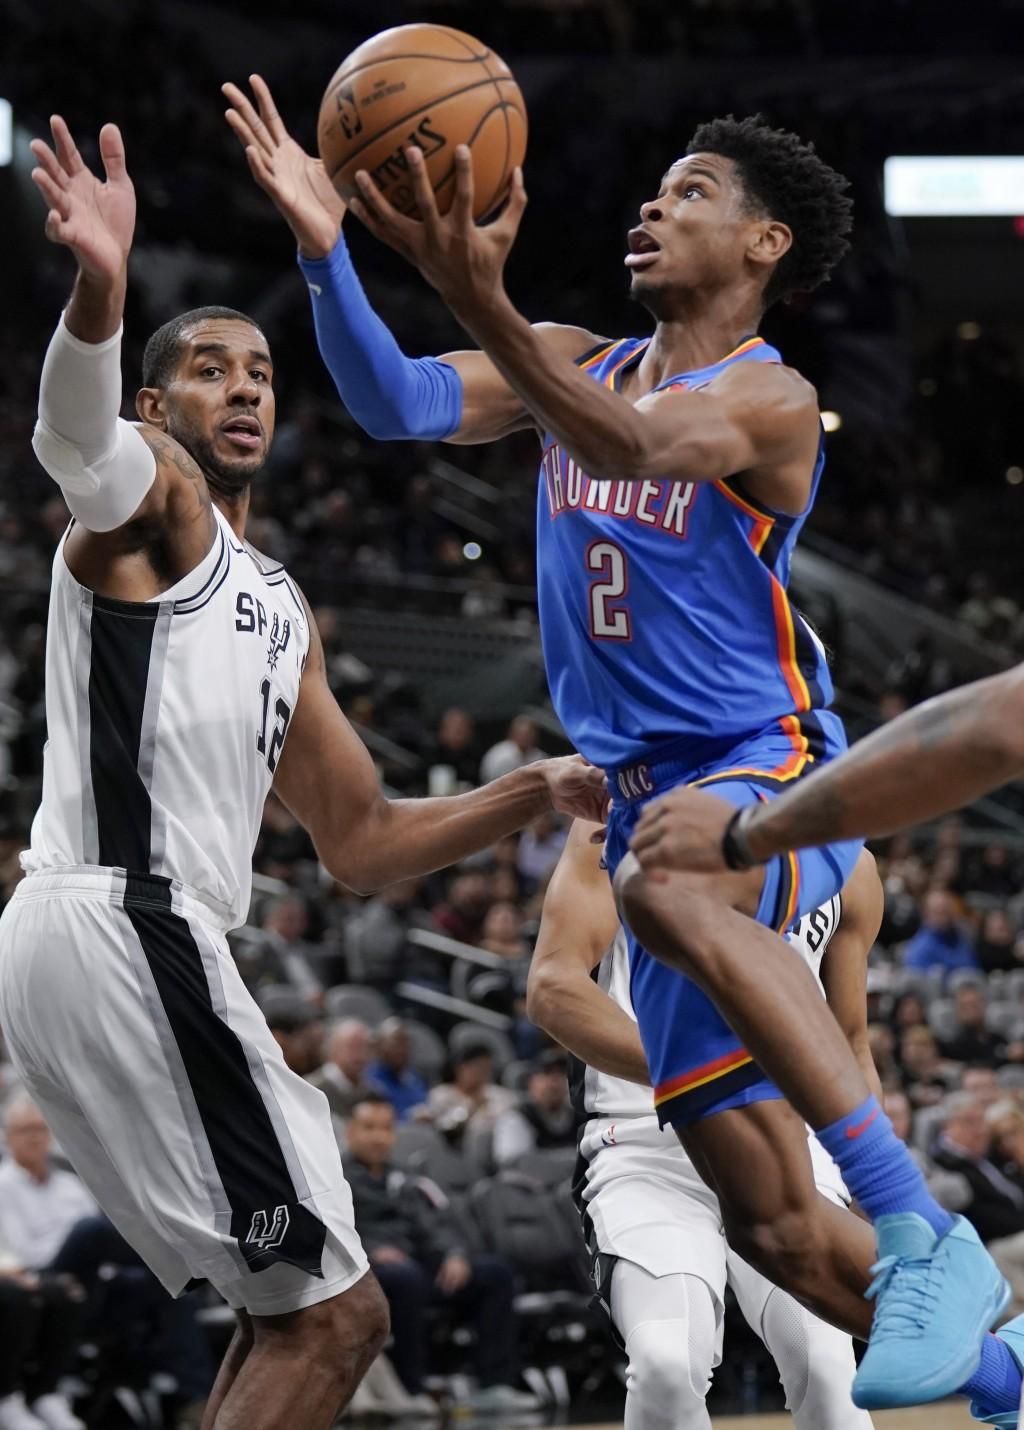 Oklahoma City Thunder's Shai Gilgeous-Alexander (2) shoots against San Antonio Spurs' LaMarcus Aldridge during the first half of an NBA basketball gam...